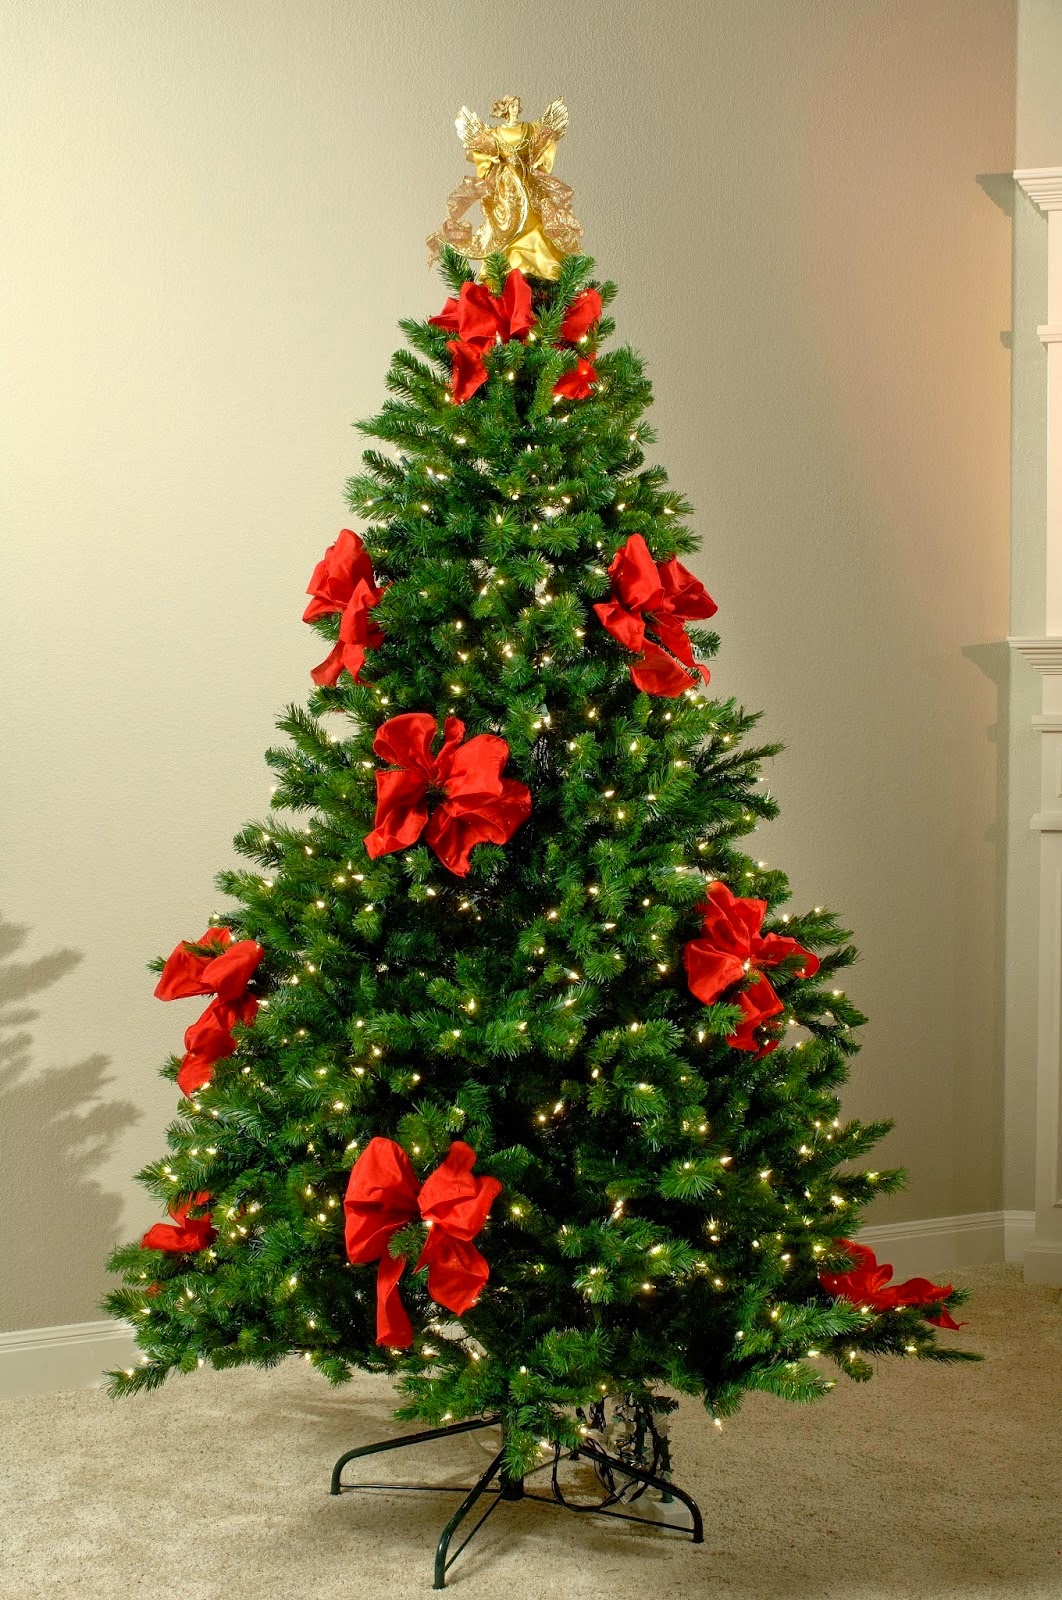 Cinco ideas para tu arbolito de navidad thecoolfashiion for Decoracion christmas navidenos